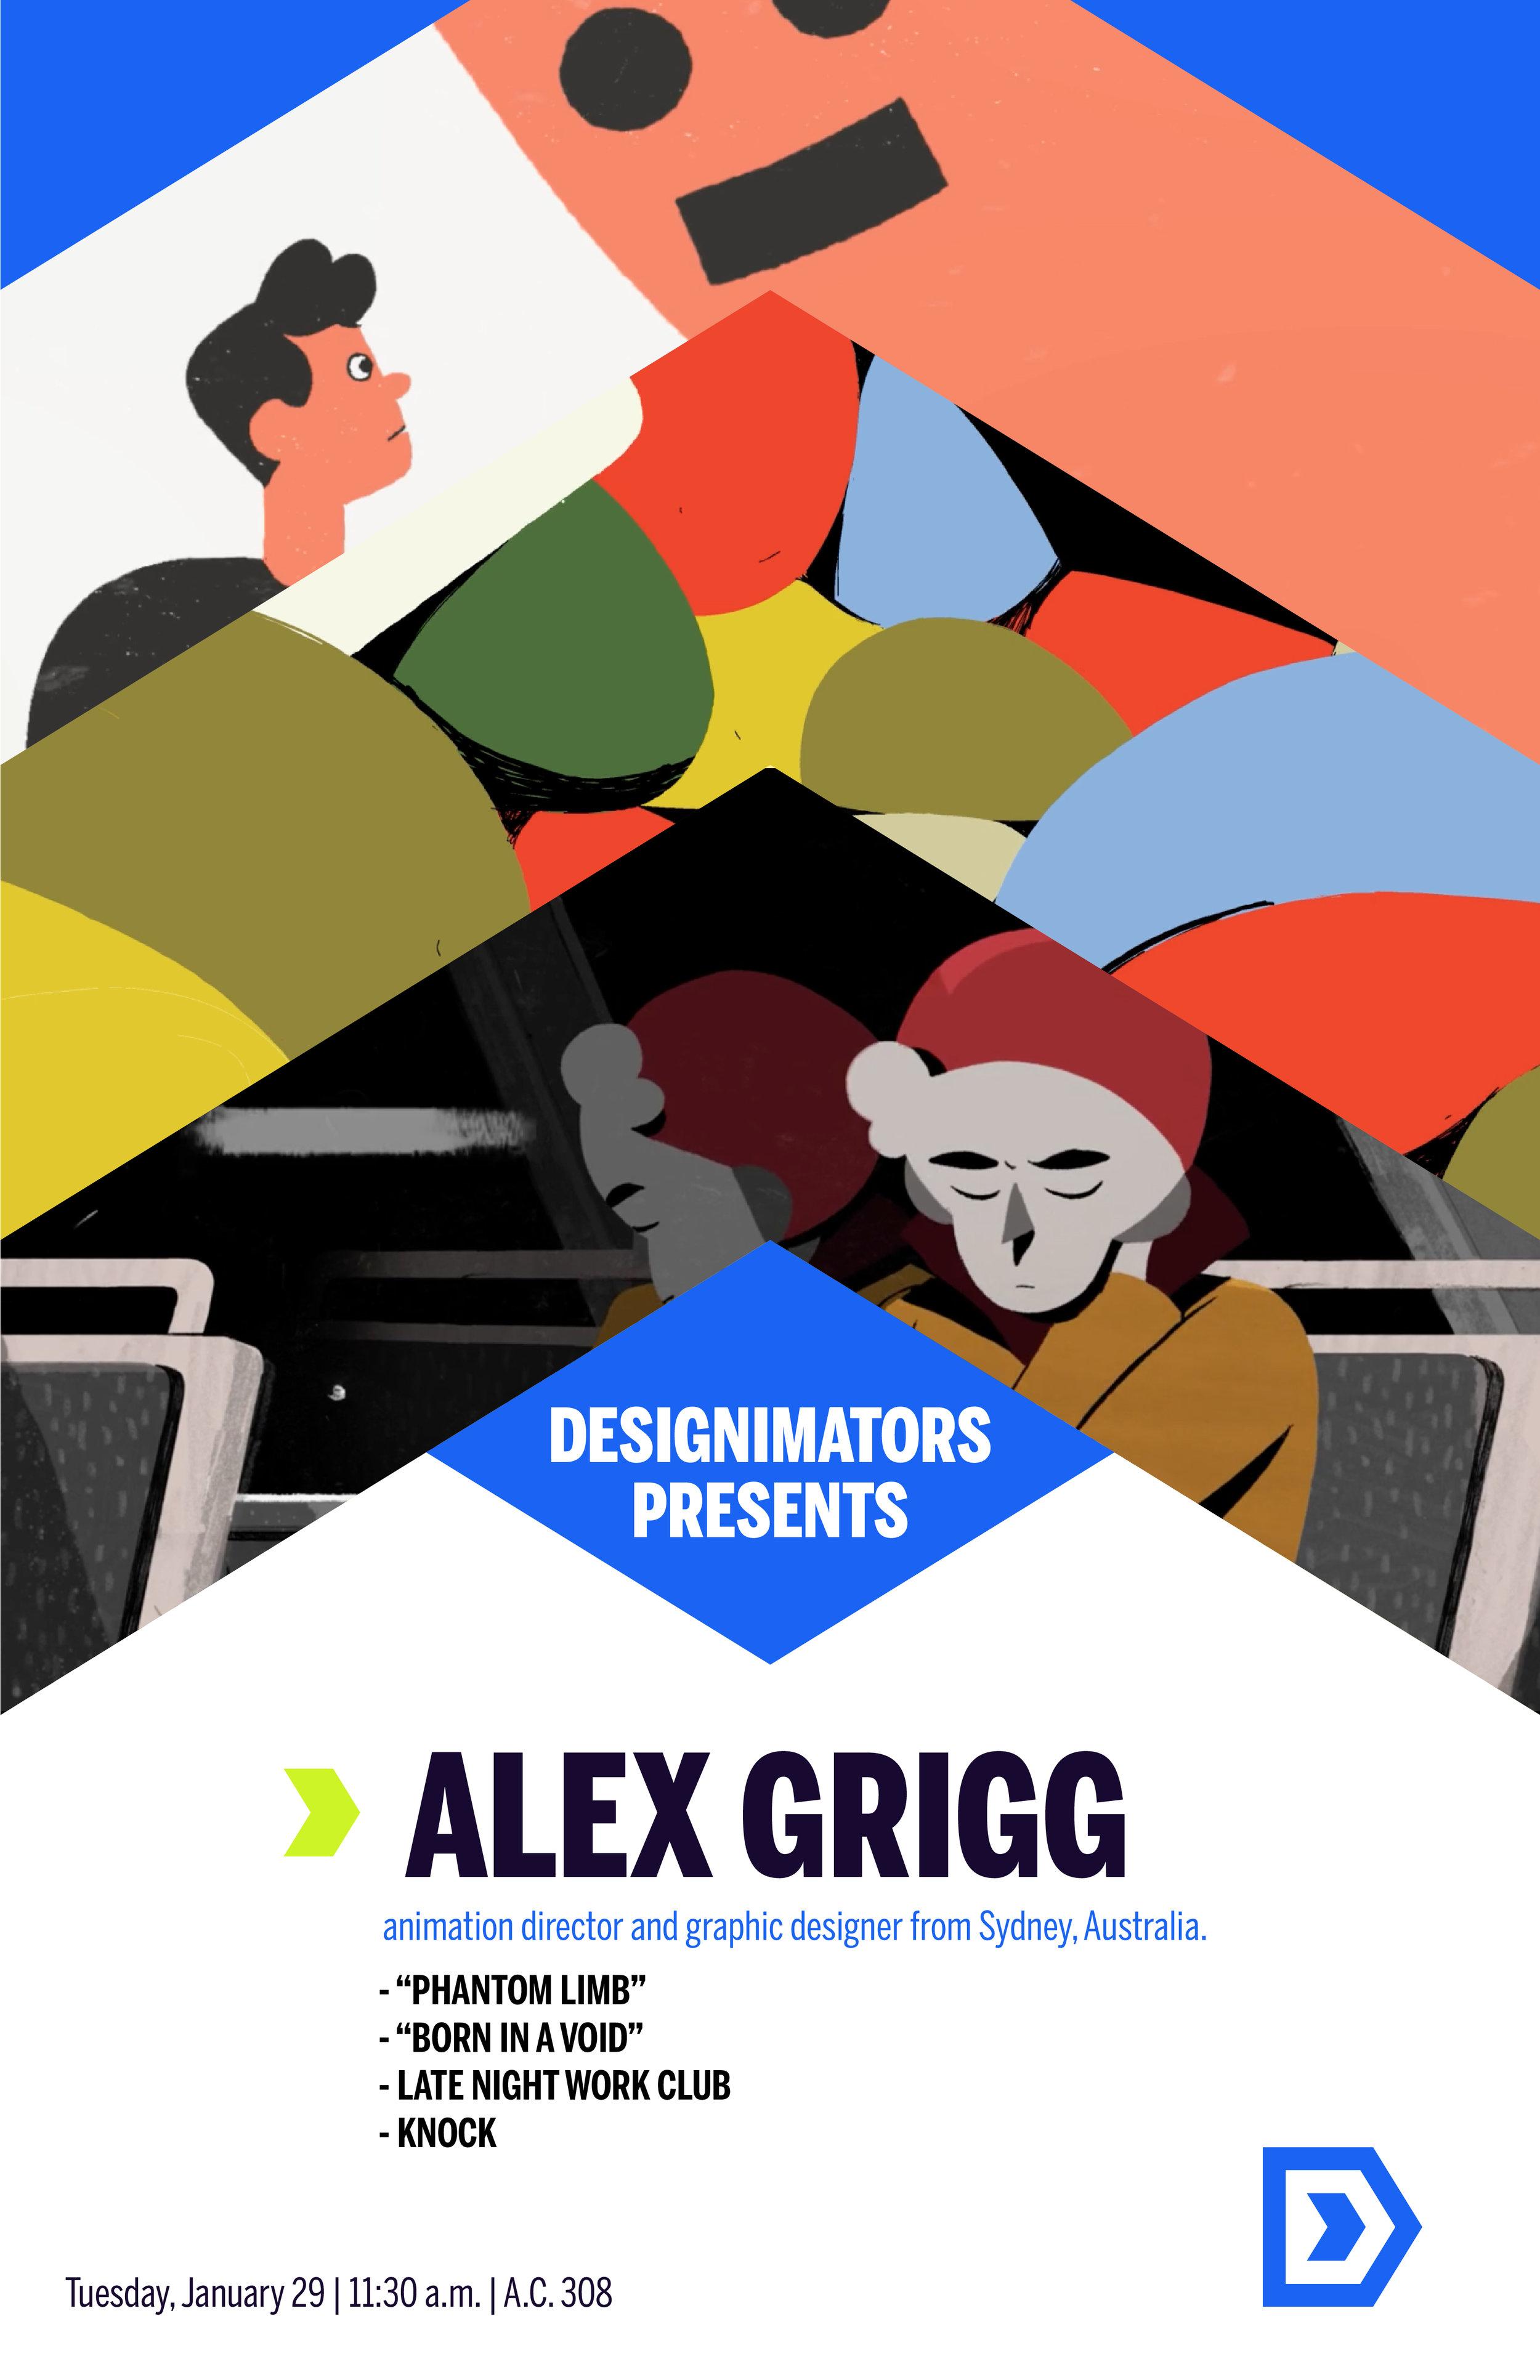 Designimators_Poster_AlexGrigg_v03-01.jpg